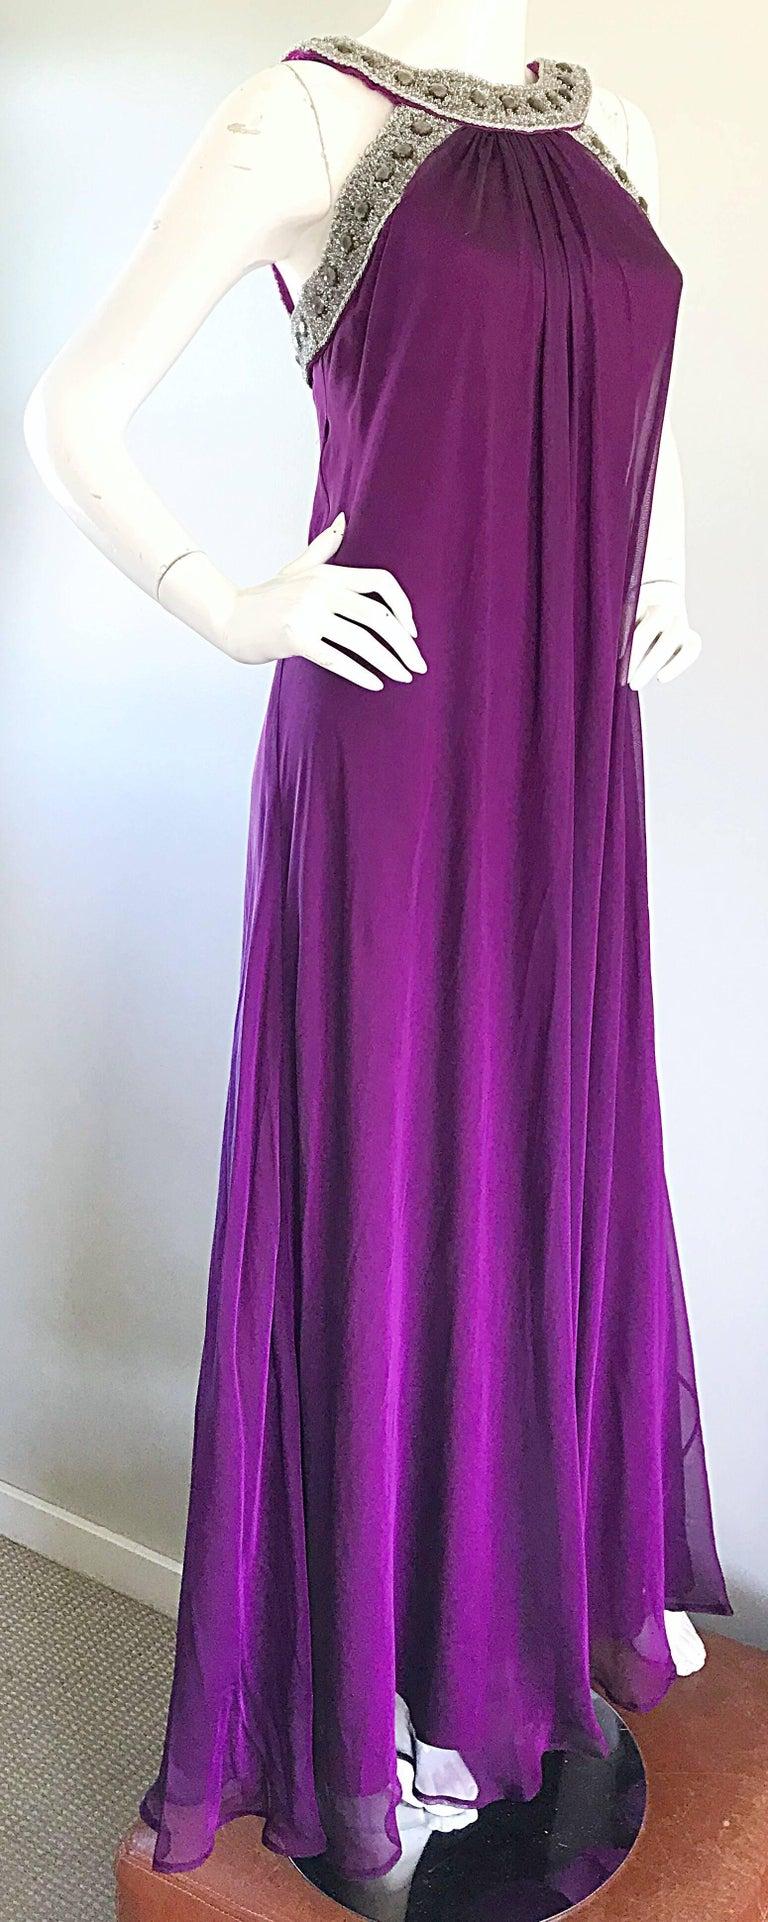 1990s Badgley Mischka Sz 4 6 Purple Silk Chiffon Rhinestone Vintage Grecian Gown For Sale 4